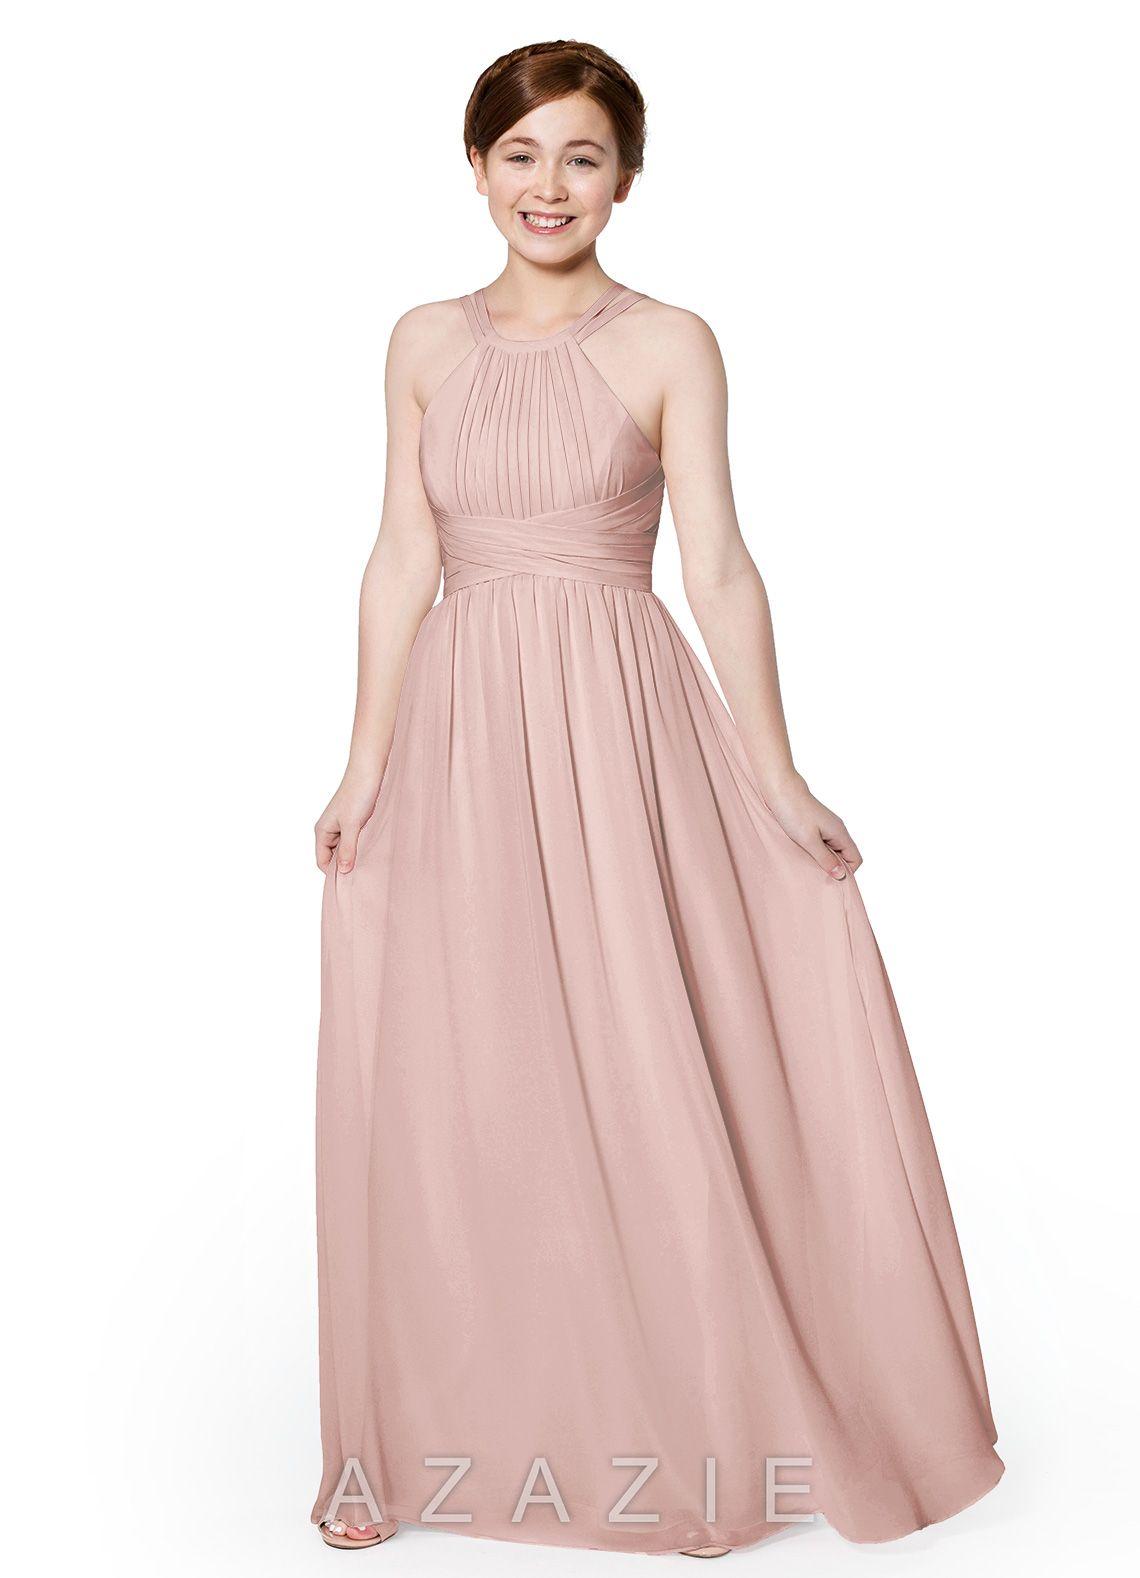 9e192b41466 Azazie Melinda JBD Junior Bridesmaid Dress